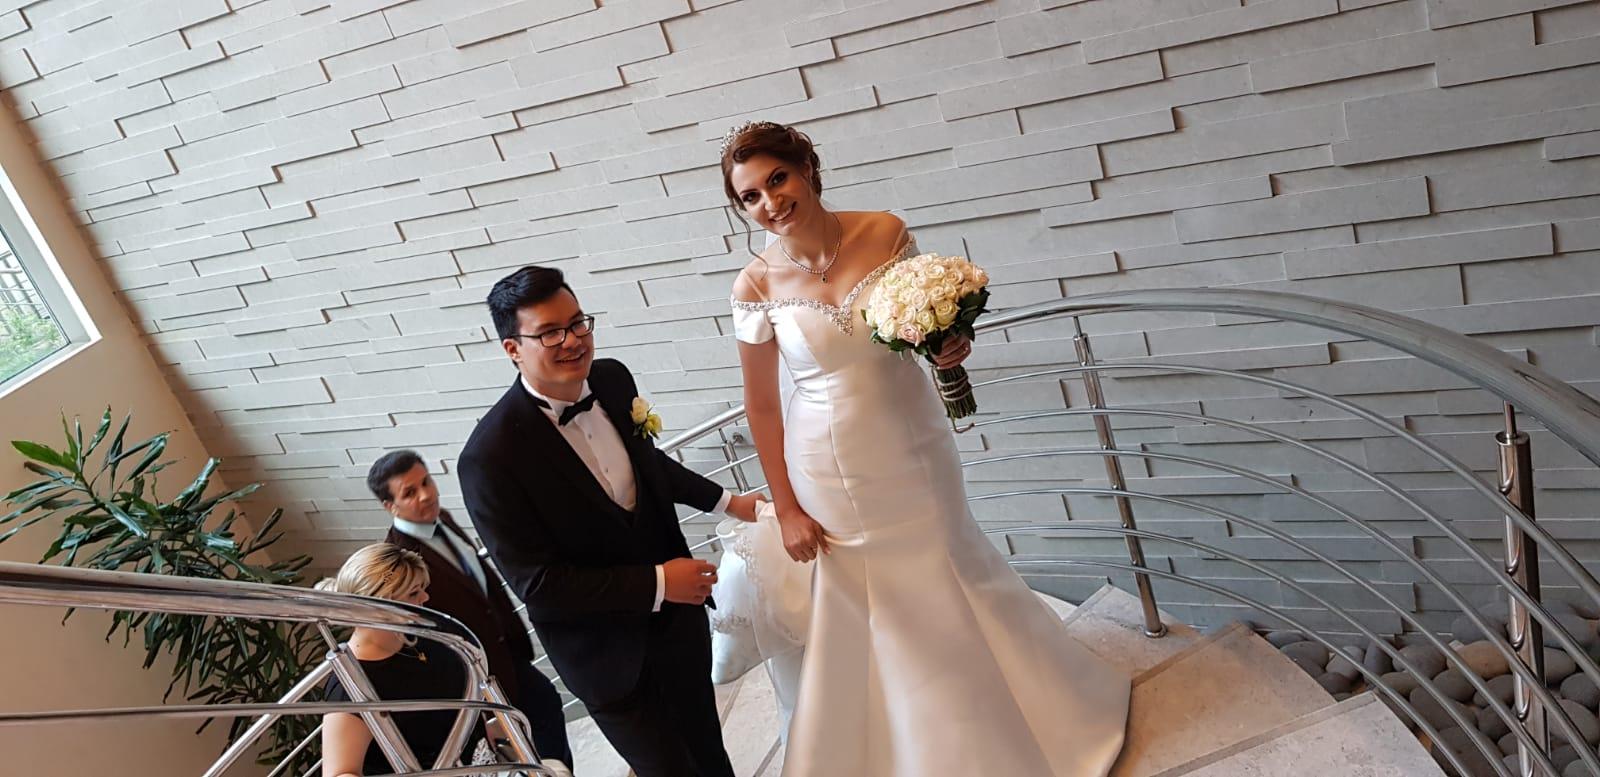 iranian luxury wedding planner in turkey